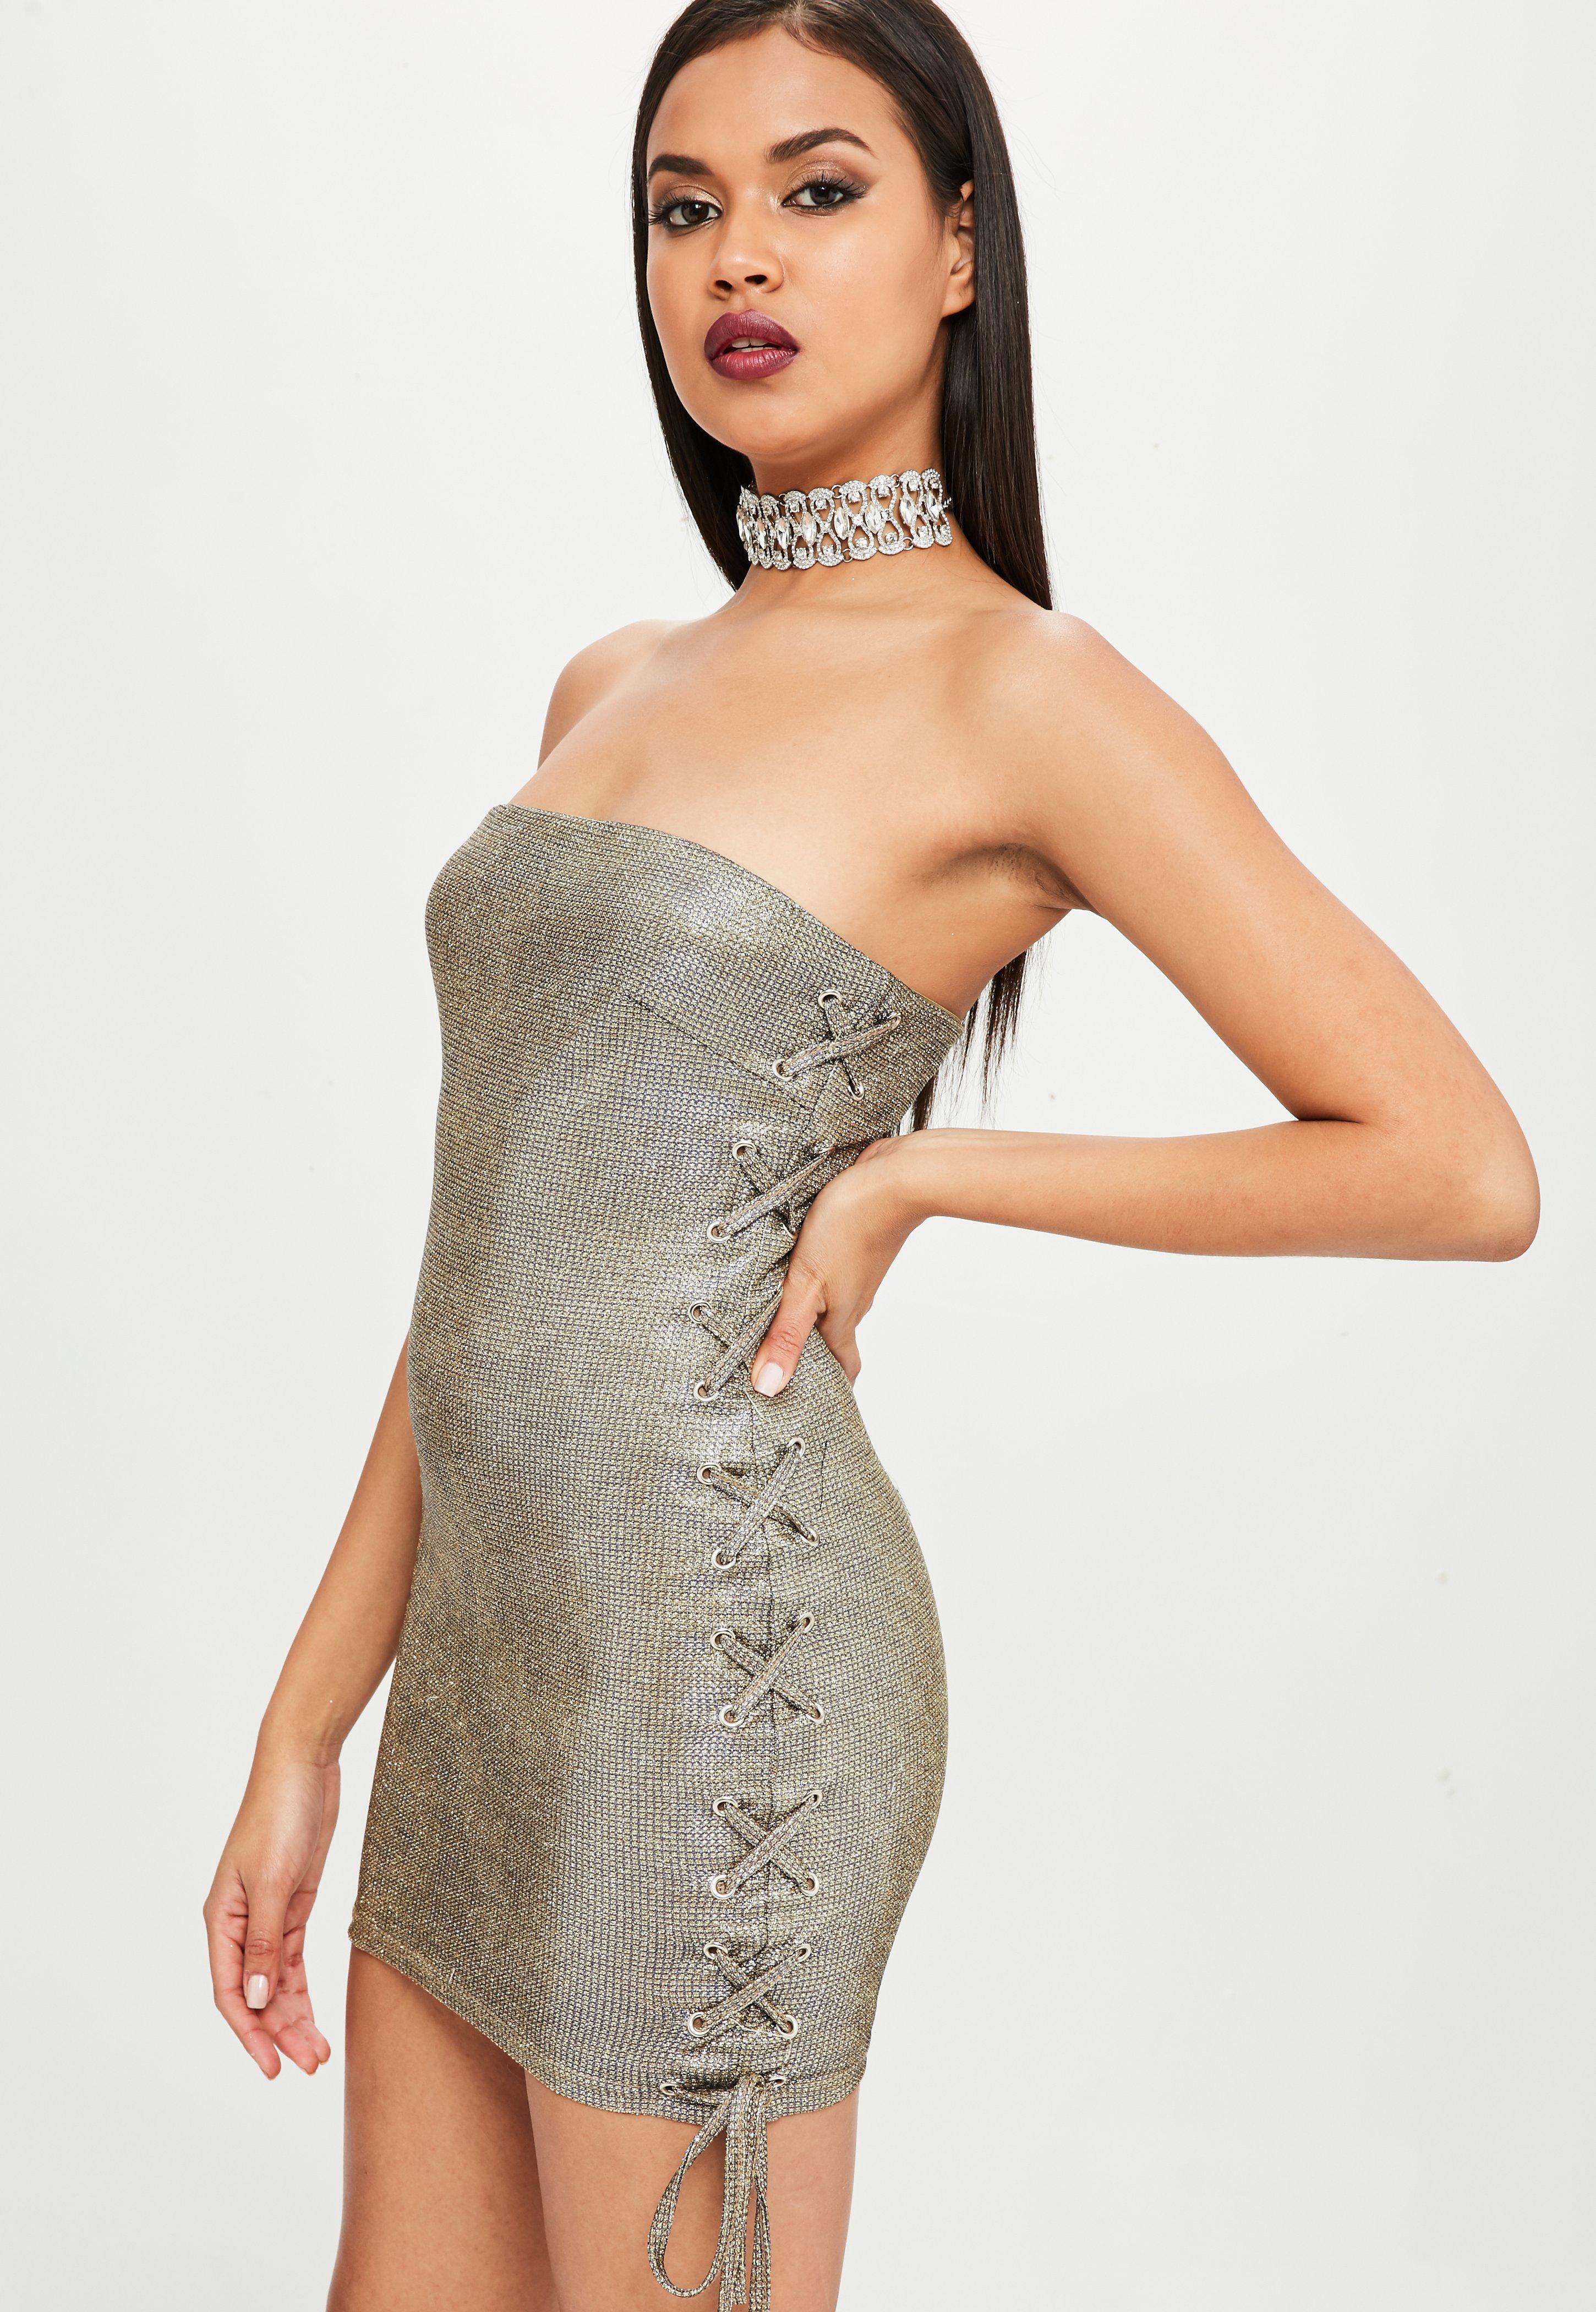 f04ae167a58a Missguided Carli Bybel X Gold Metallic Bandeau Dress in Metallic - Lyst